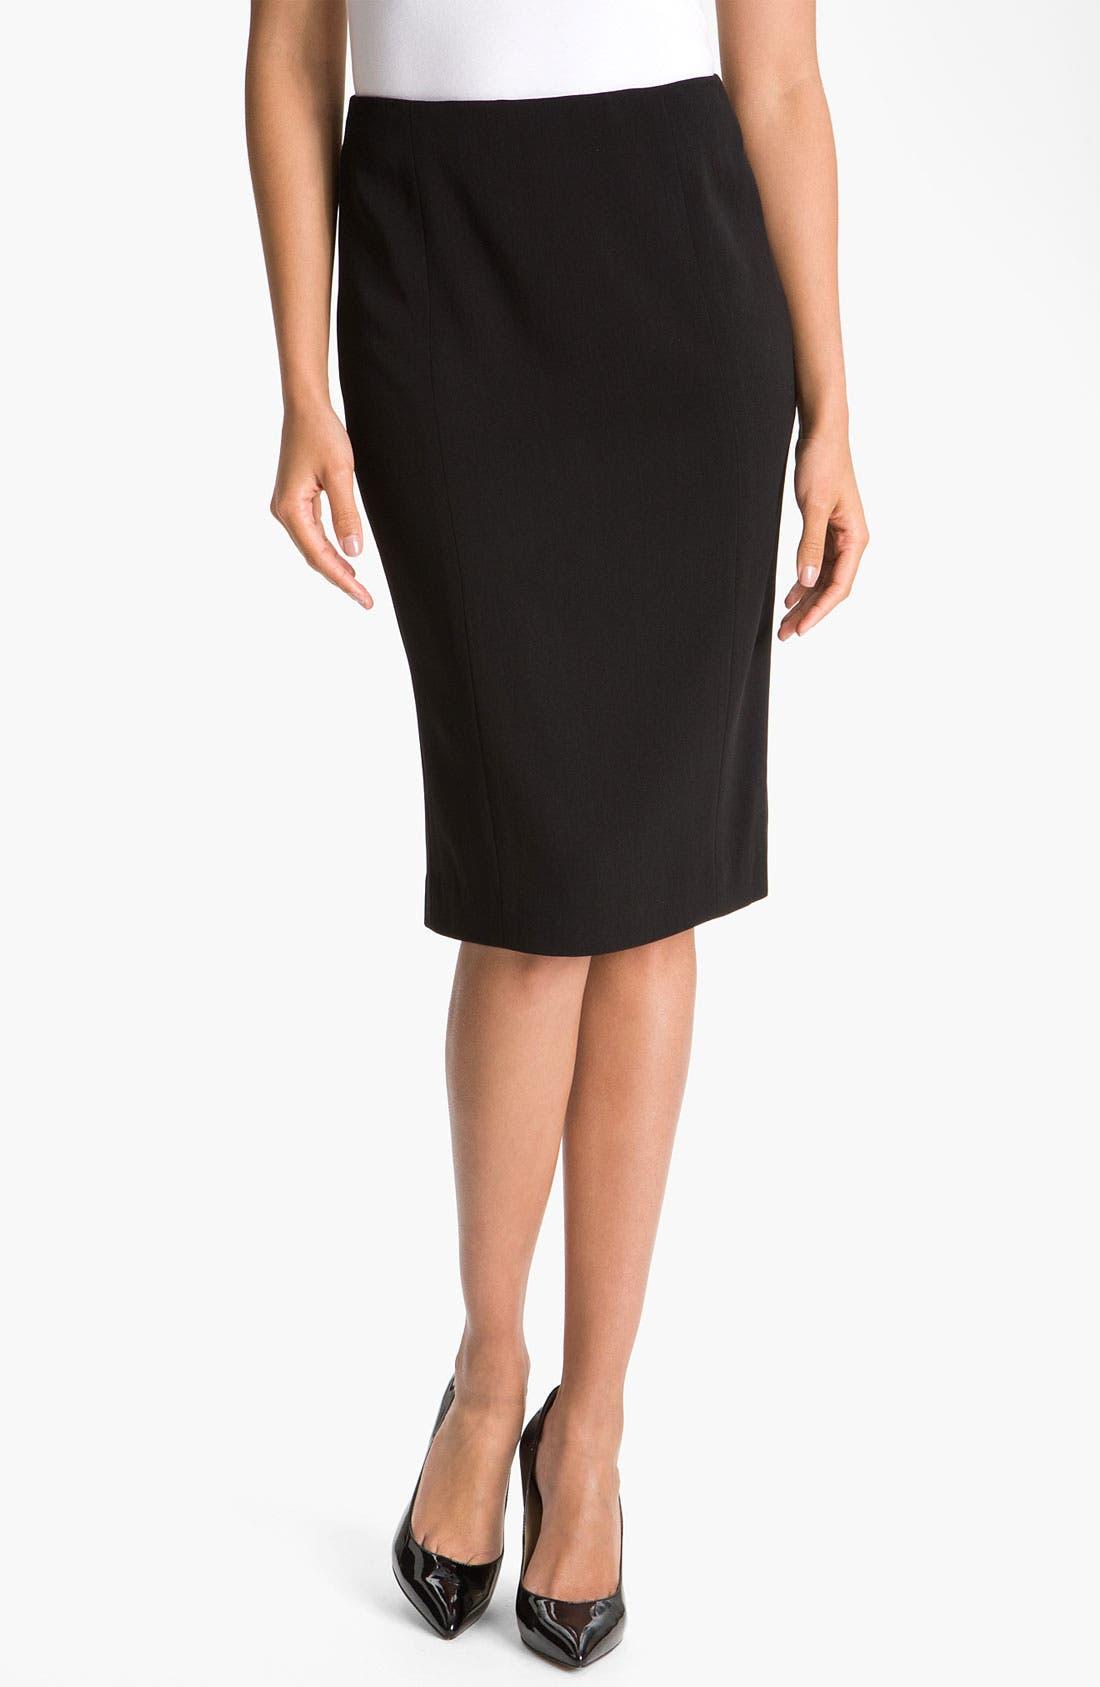 Alternate Image 1 Selected - Theory 'Rita - Tailor' Pencil Skirt